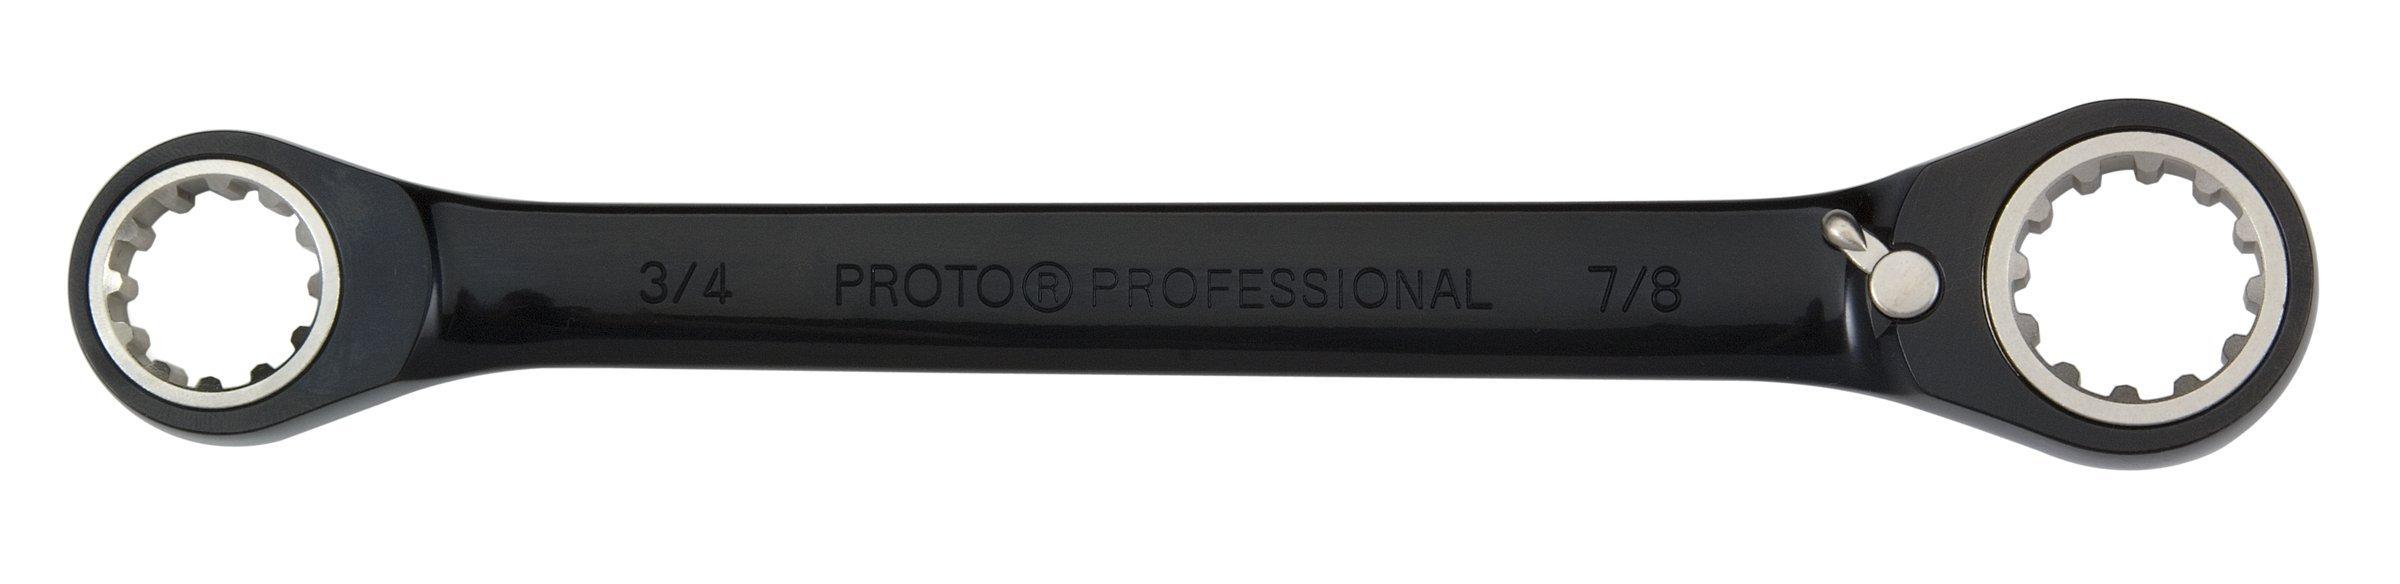 Stanley Proto JSBV0810 Double Box Racheting Spline Wrench 1/4 X 5/16 by Proto